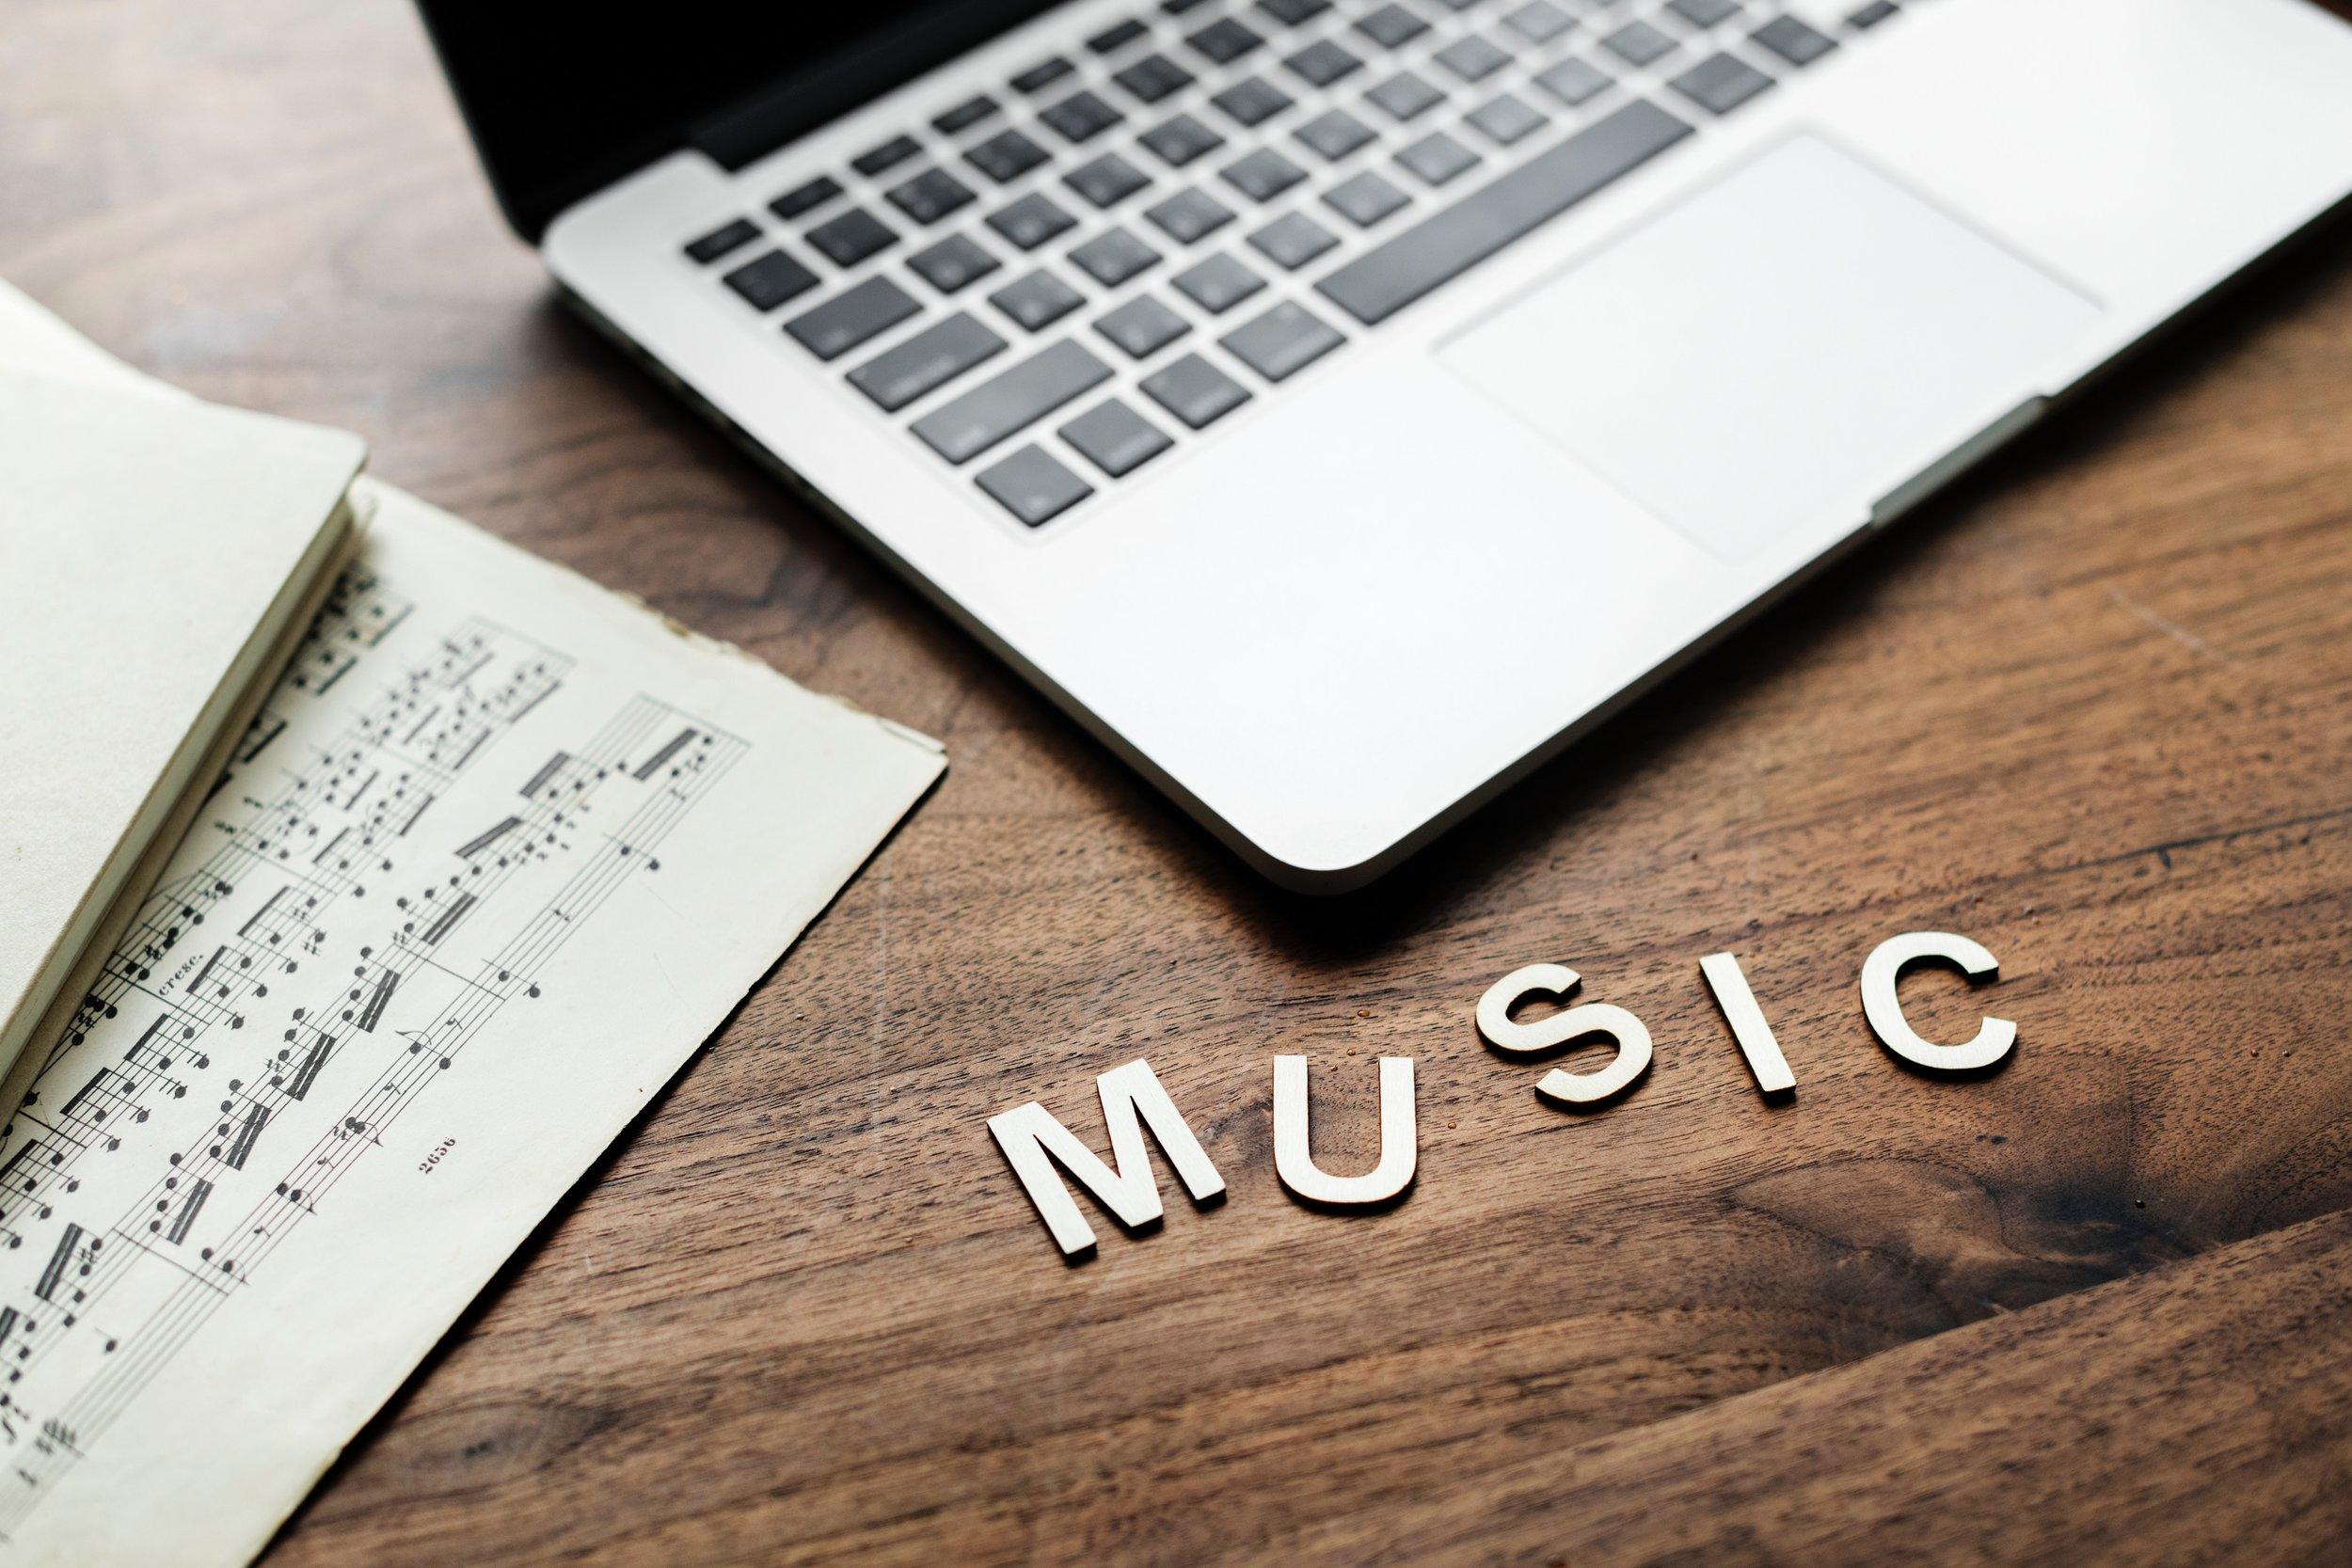 Music and Laptop-unsplash.jpg